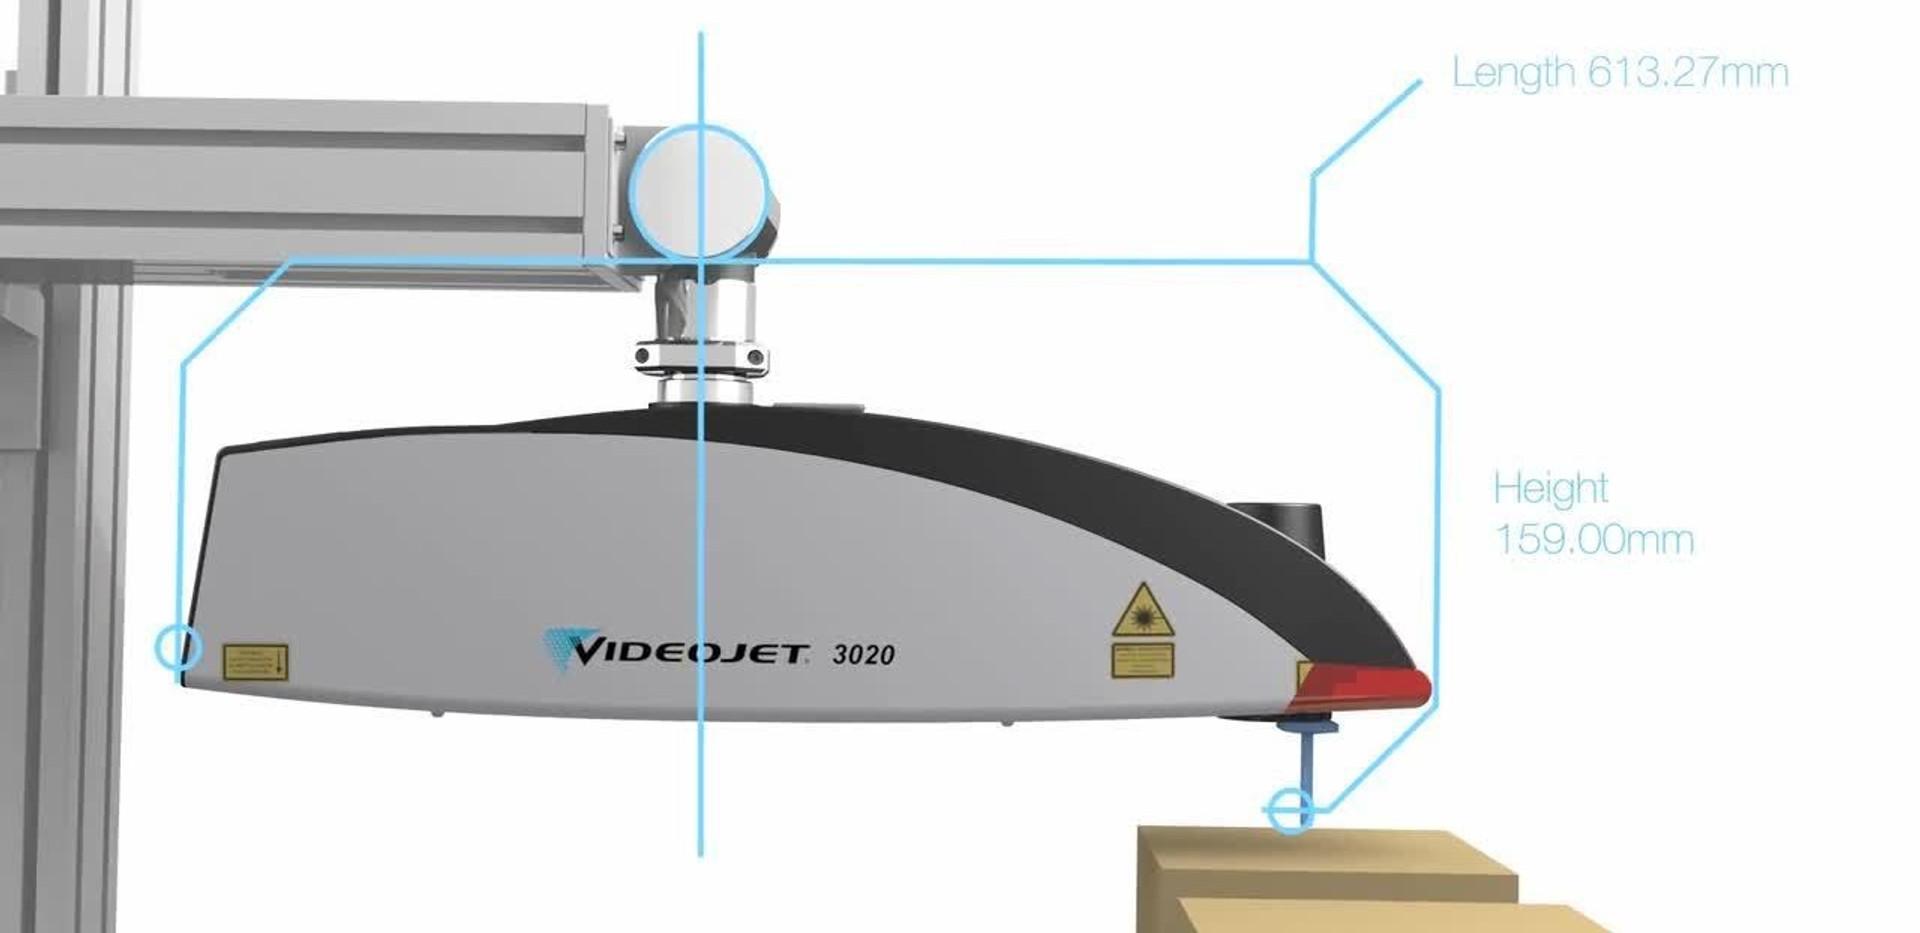 VJ3020 demo